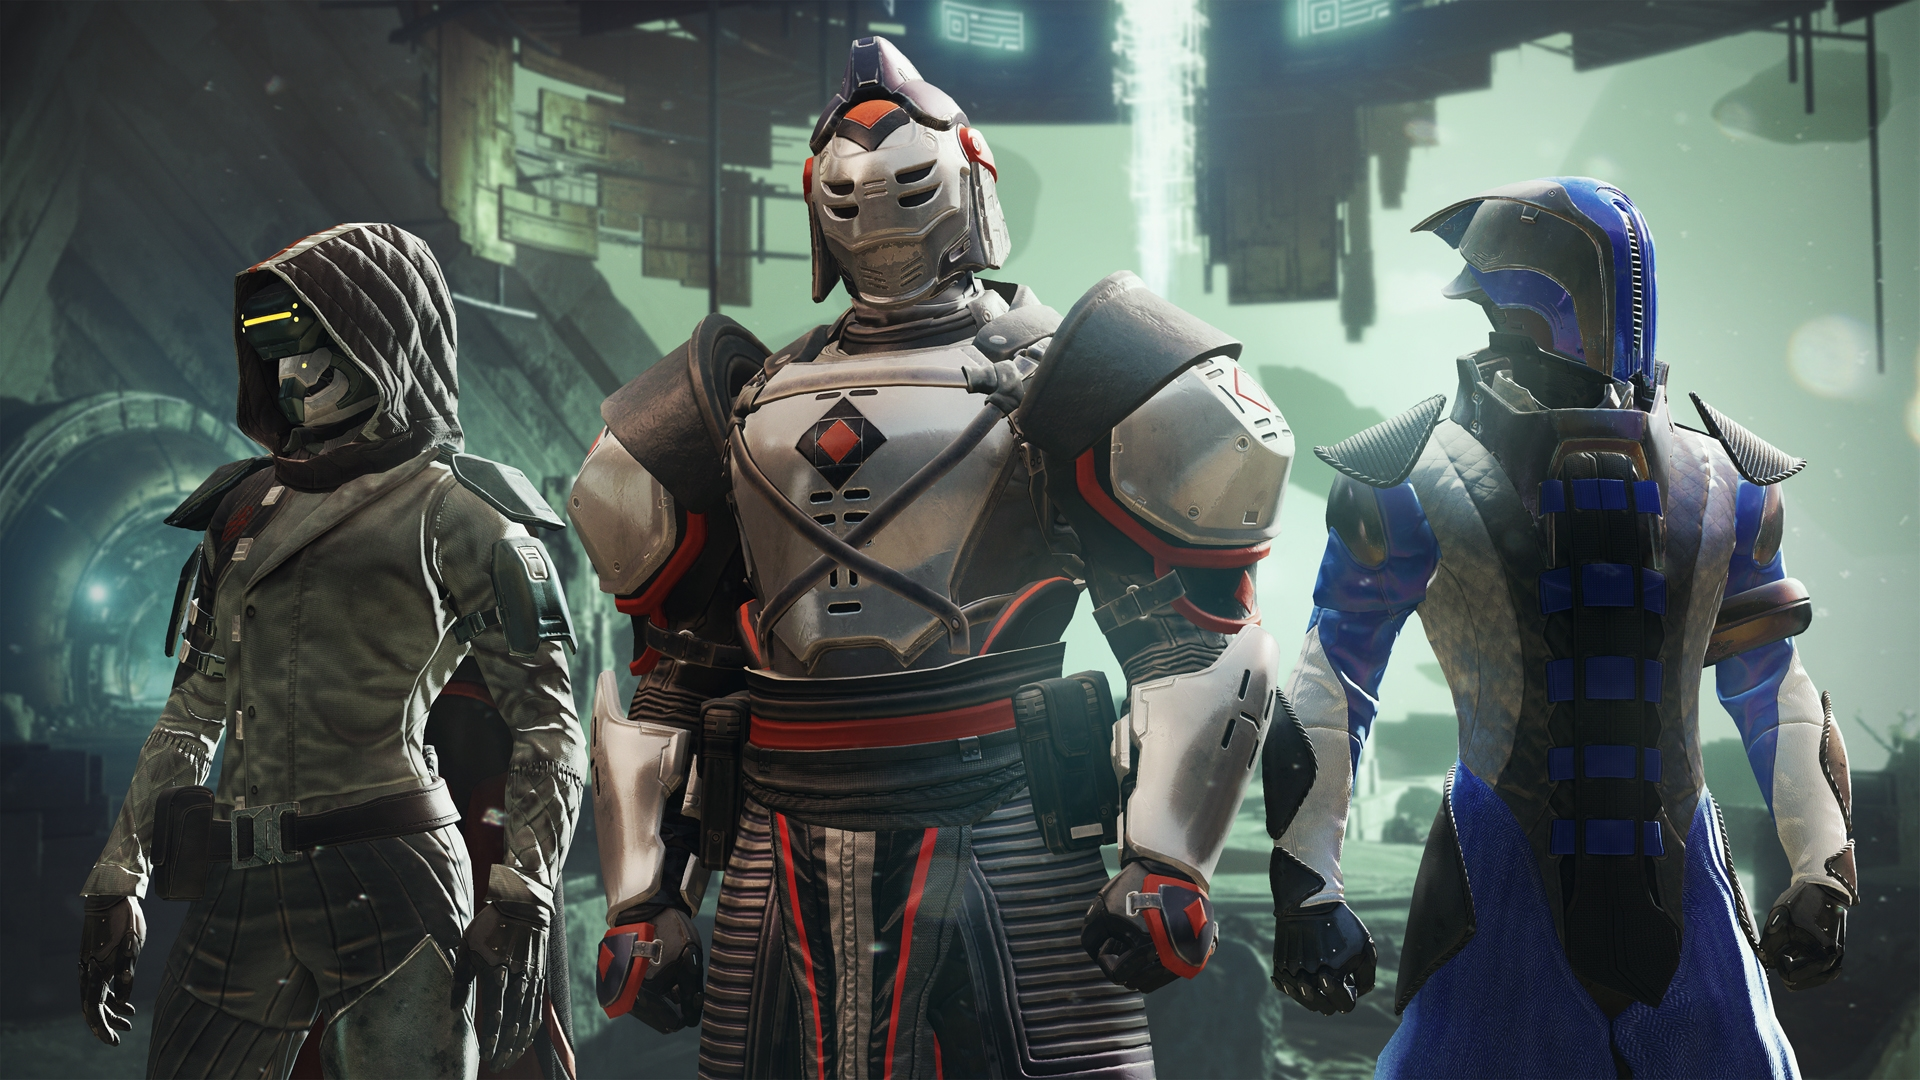 Games Inbox: Destiny 3 ideas, Divinity: Original Sin II vs. Pillars Of Eternity II, and Xbox Two release date